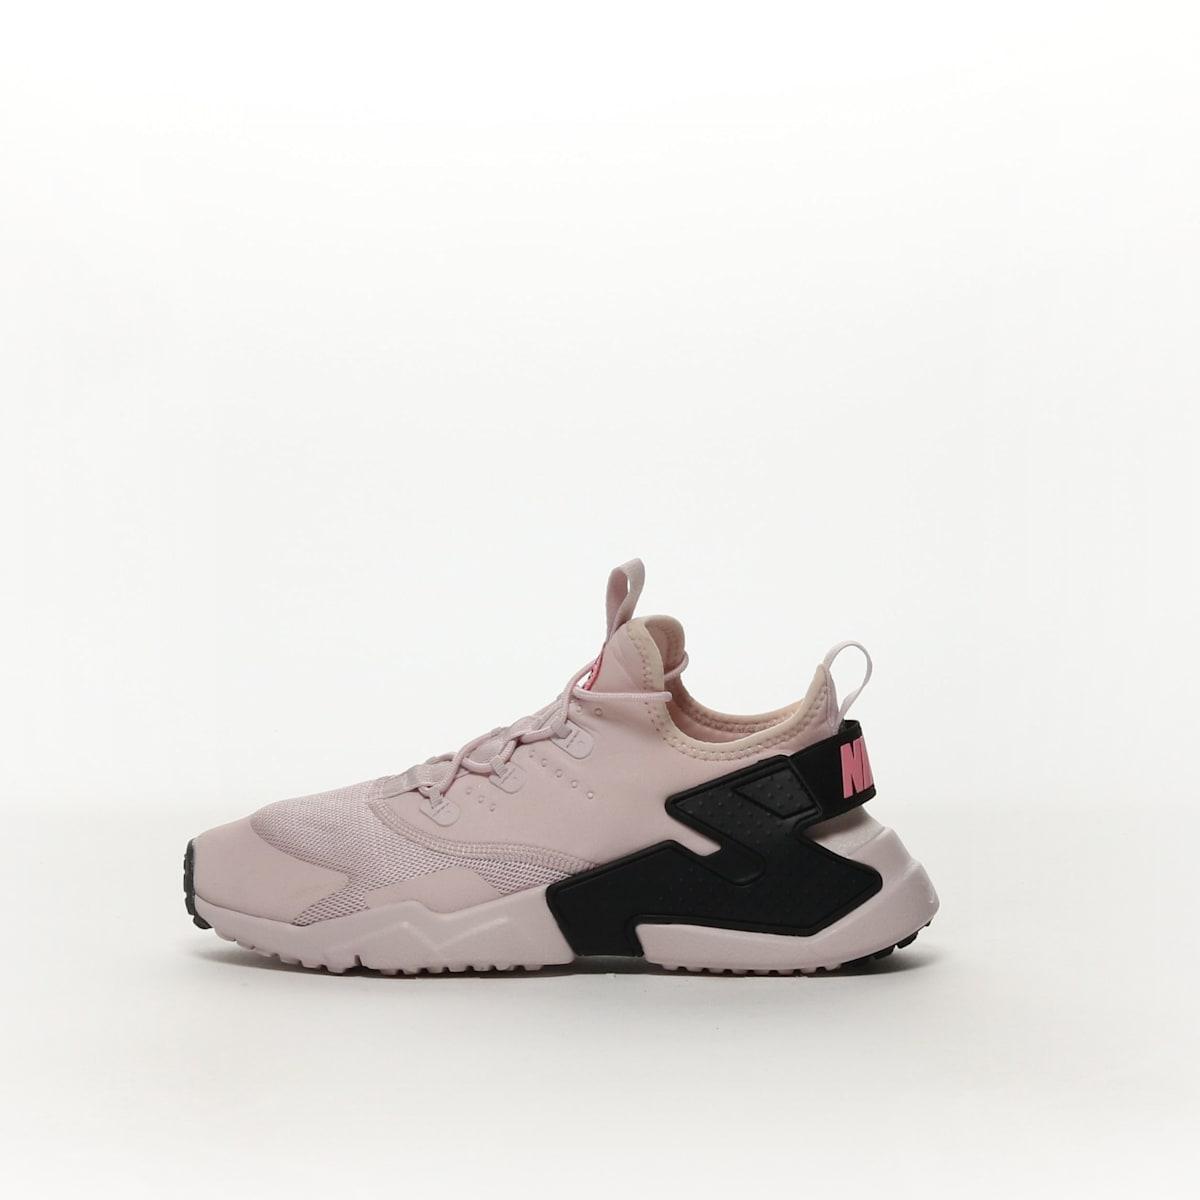 6803aec9b9524 Boys  Nike Huarache Drift (GS) Shoe - BARELY ROSE CORAL CHALK-BLACK ...